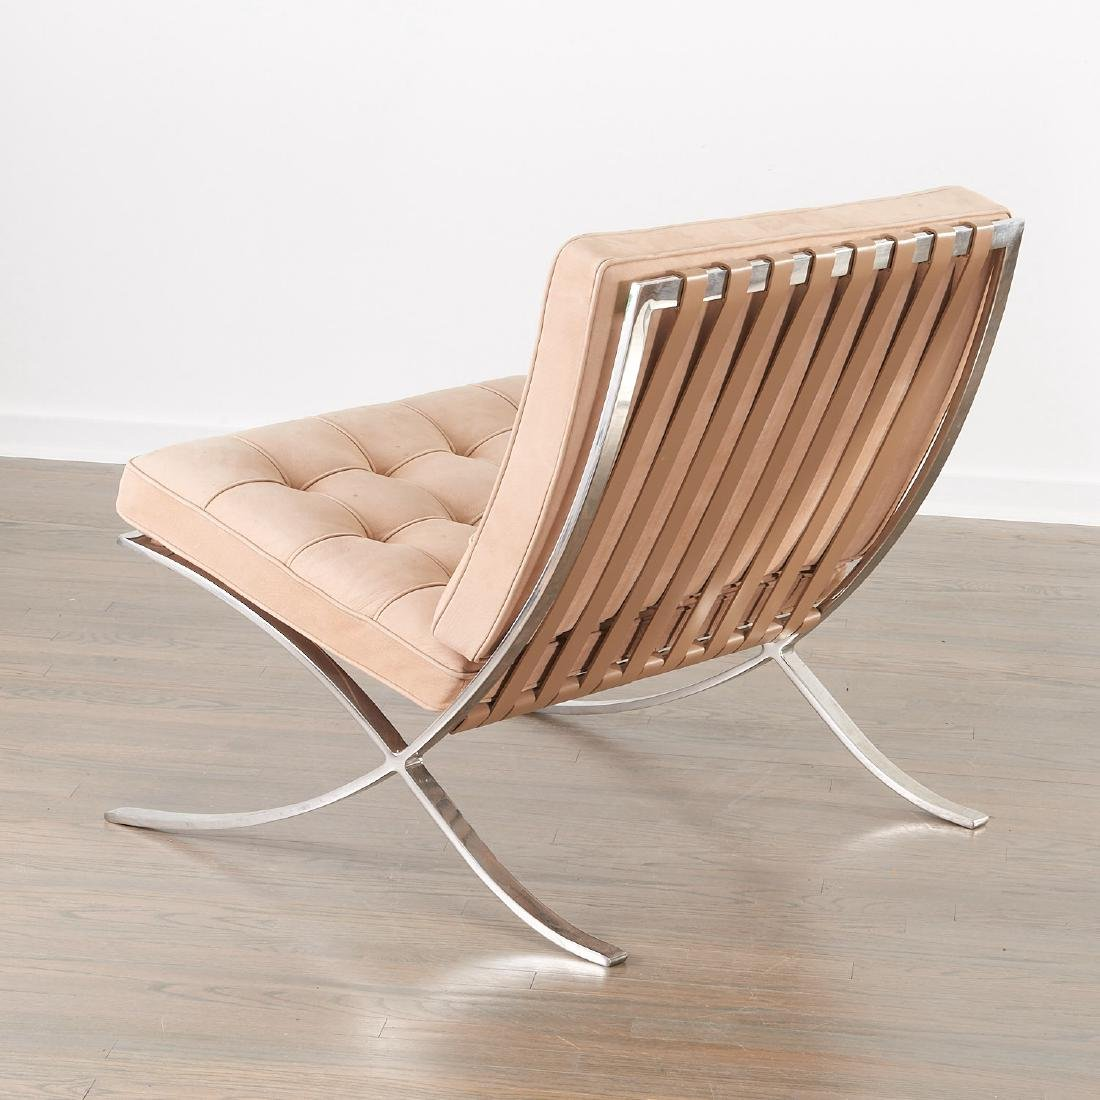 Pair Knoll Barcelona chairs - 2